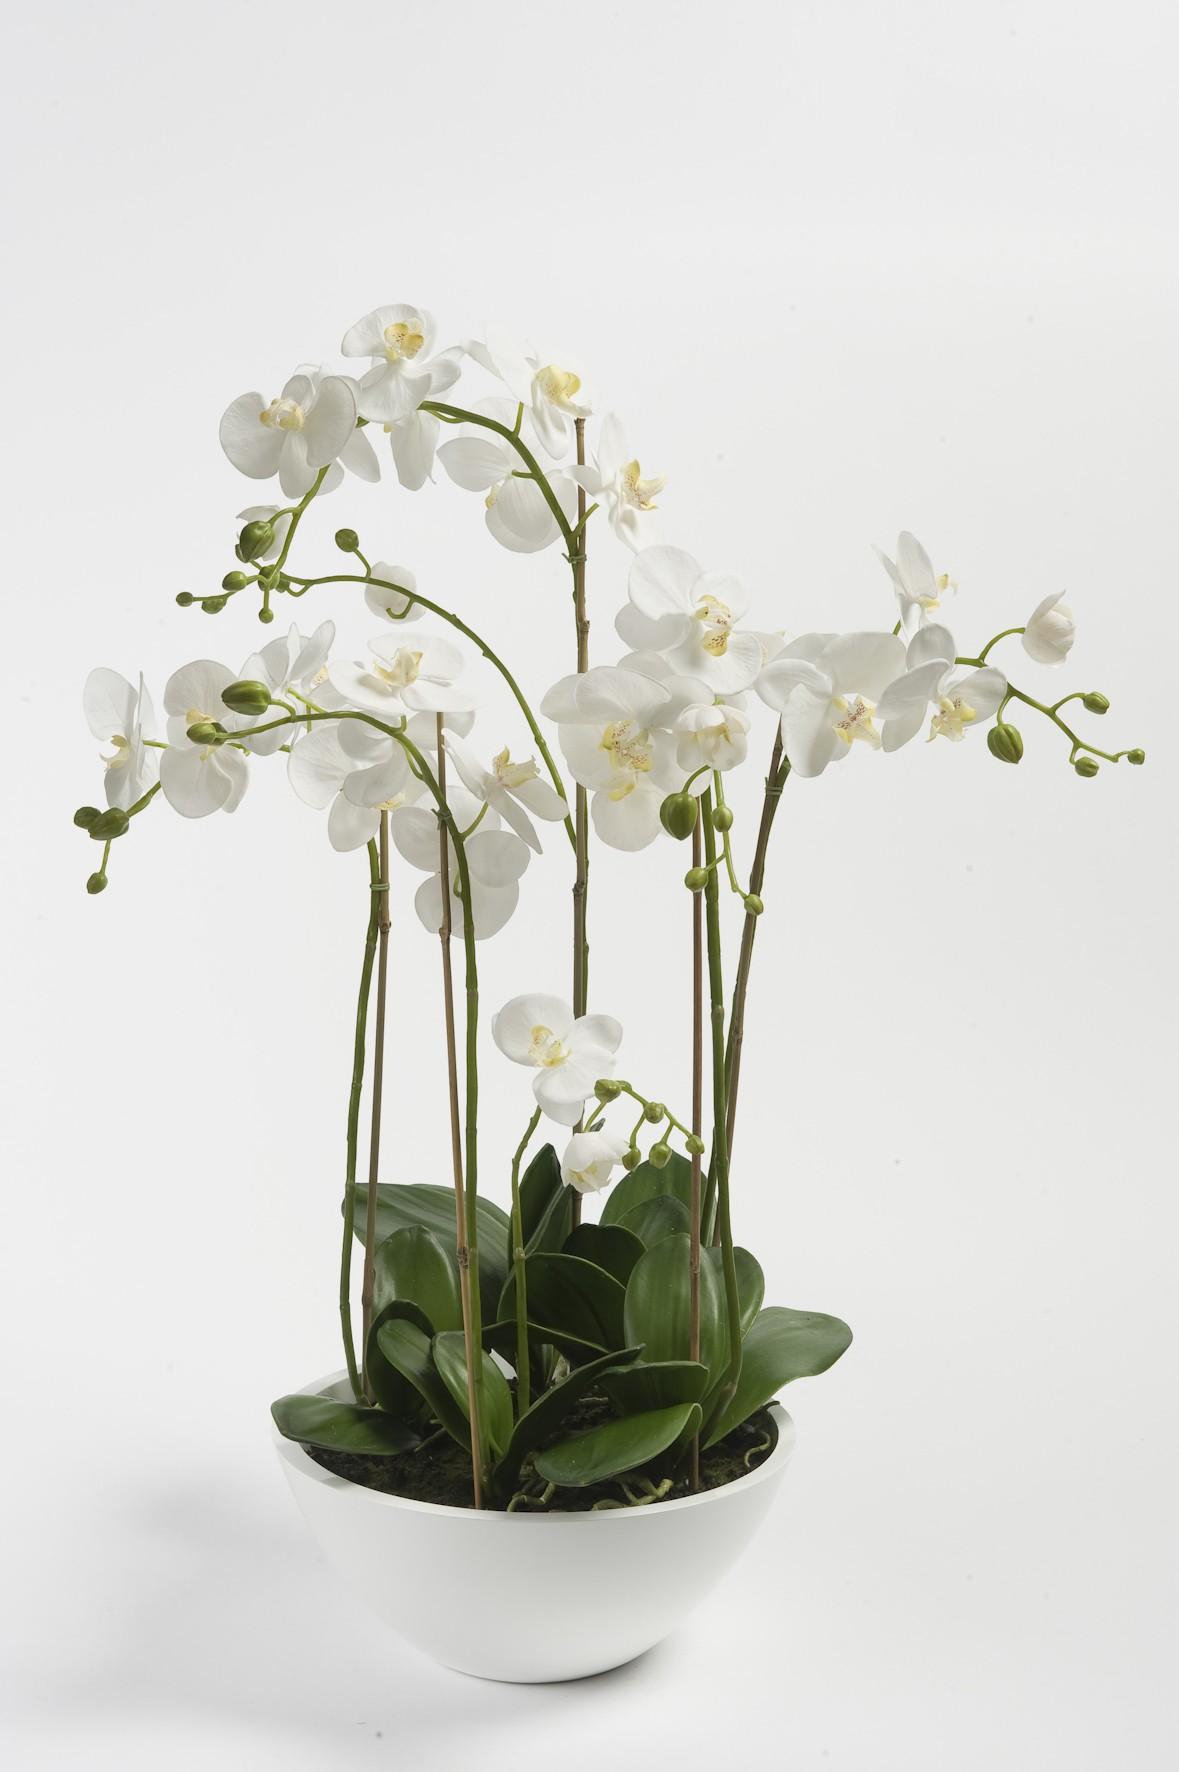 orchidee blanche artificielle